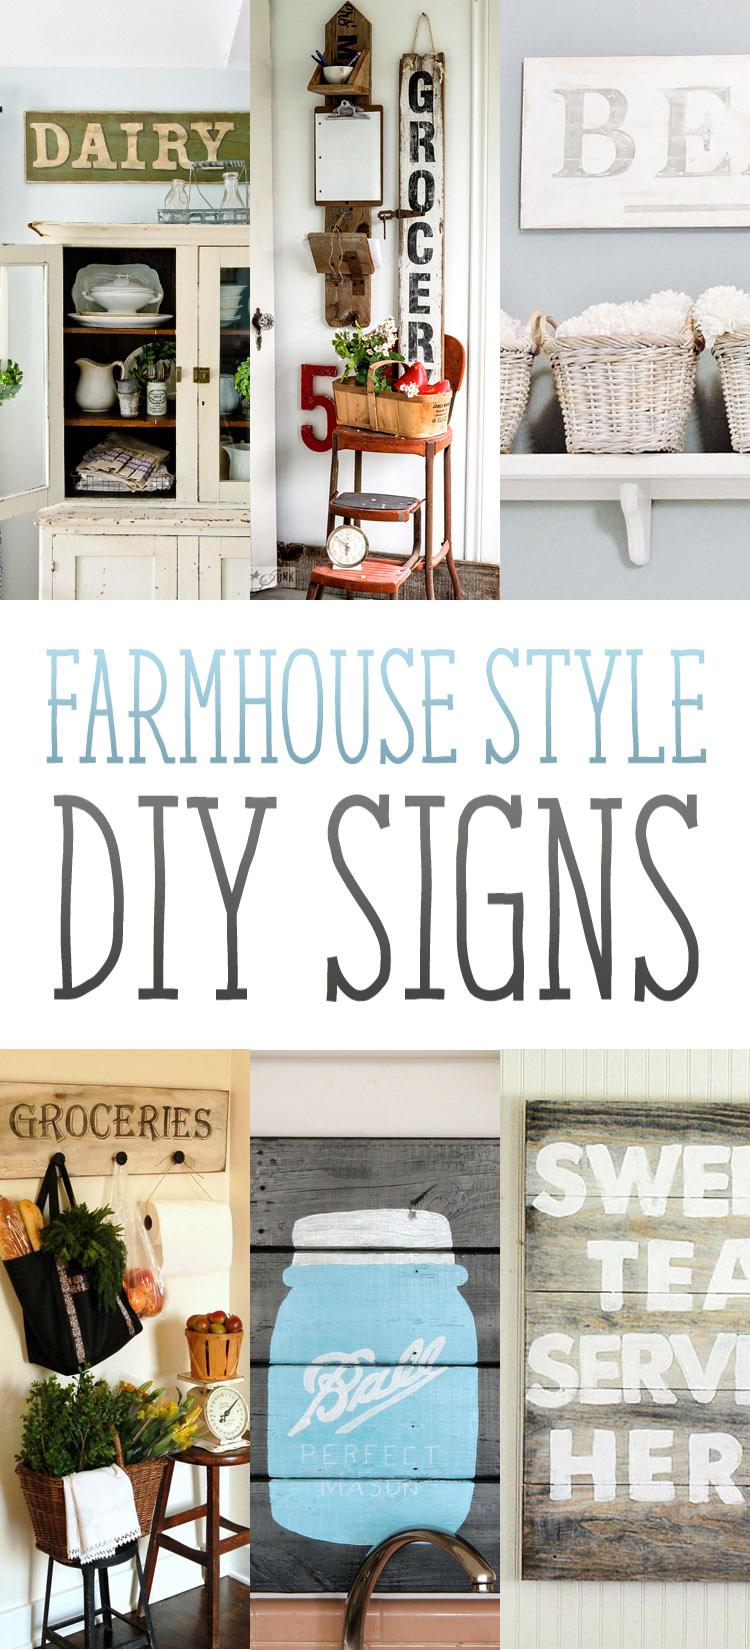 Vintage Kitchen Signs Design